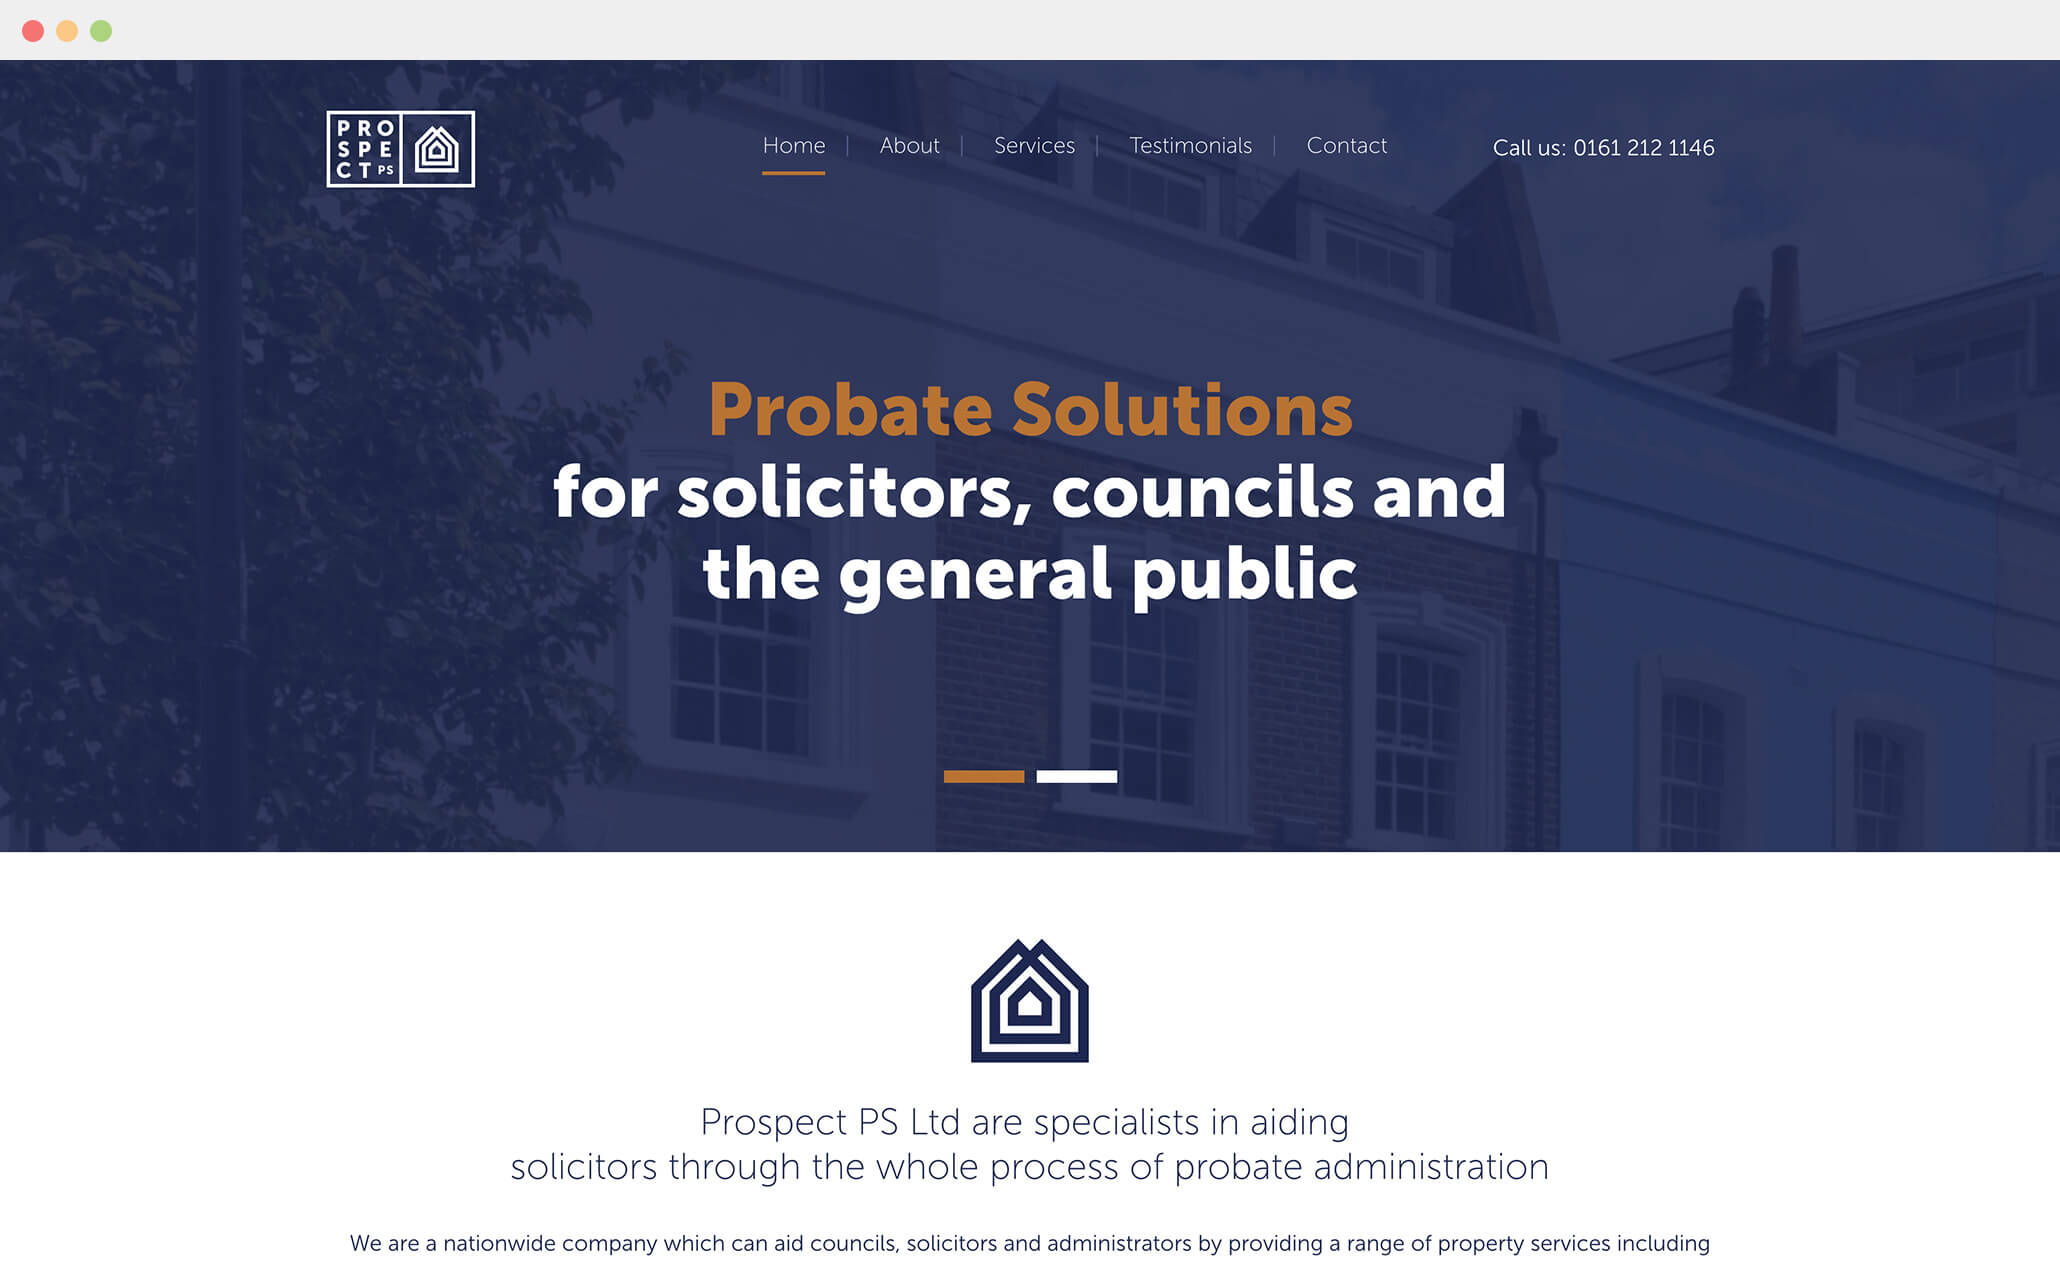 ProspectPS - website